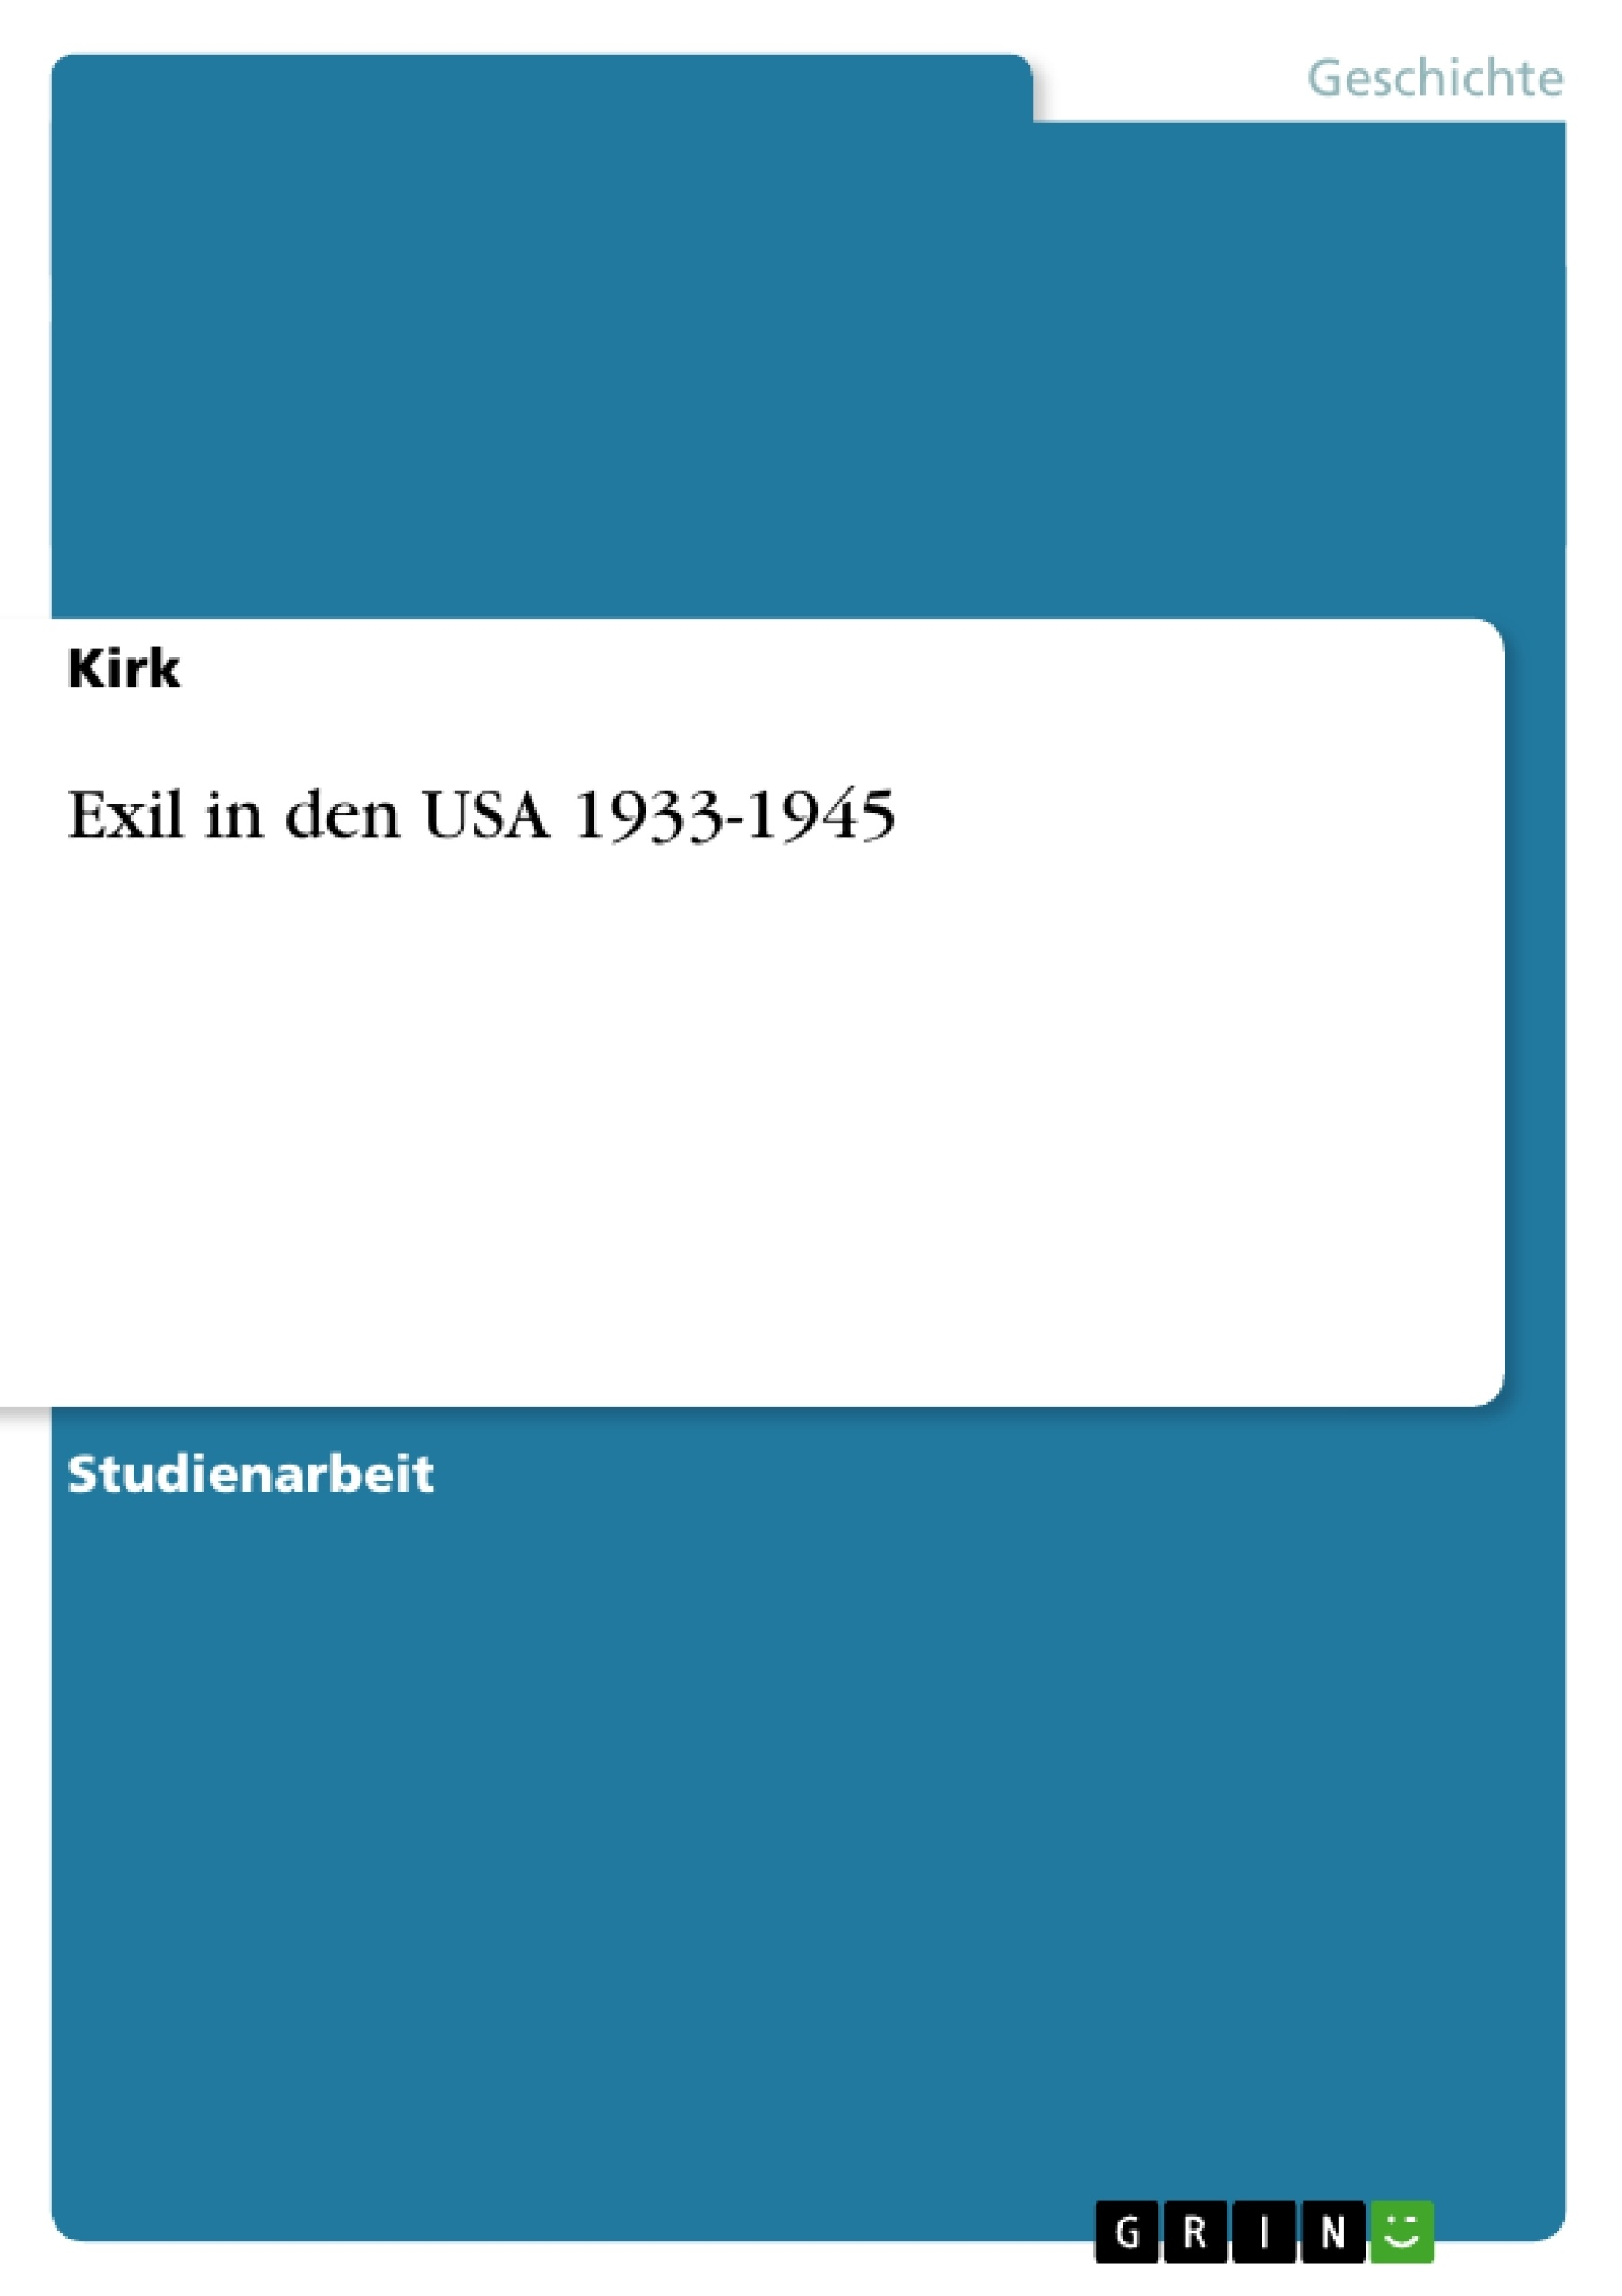 Titel: Exil in den USA 1933-1945